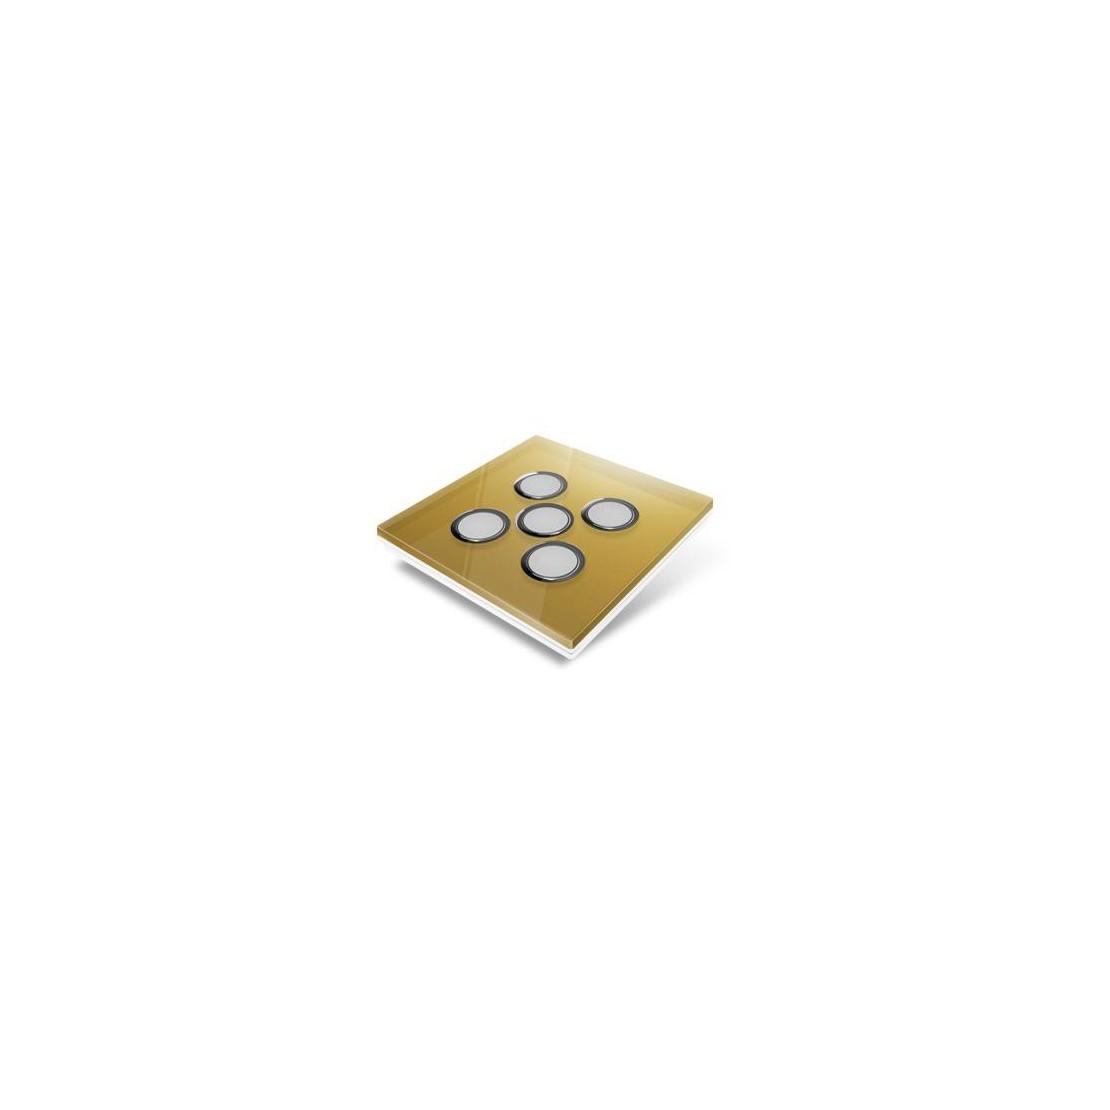 Cubierta para interruptor Edisio - crystal oro